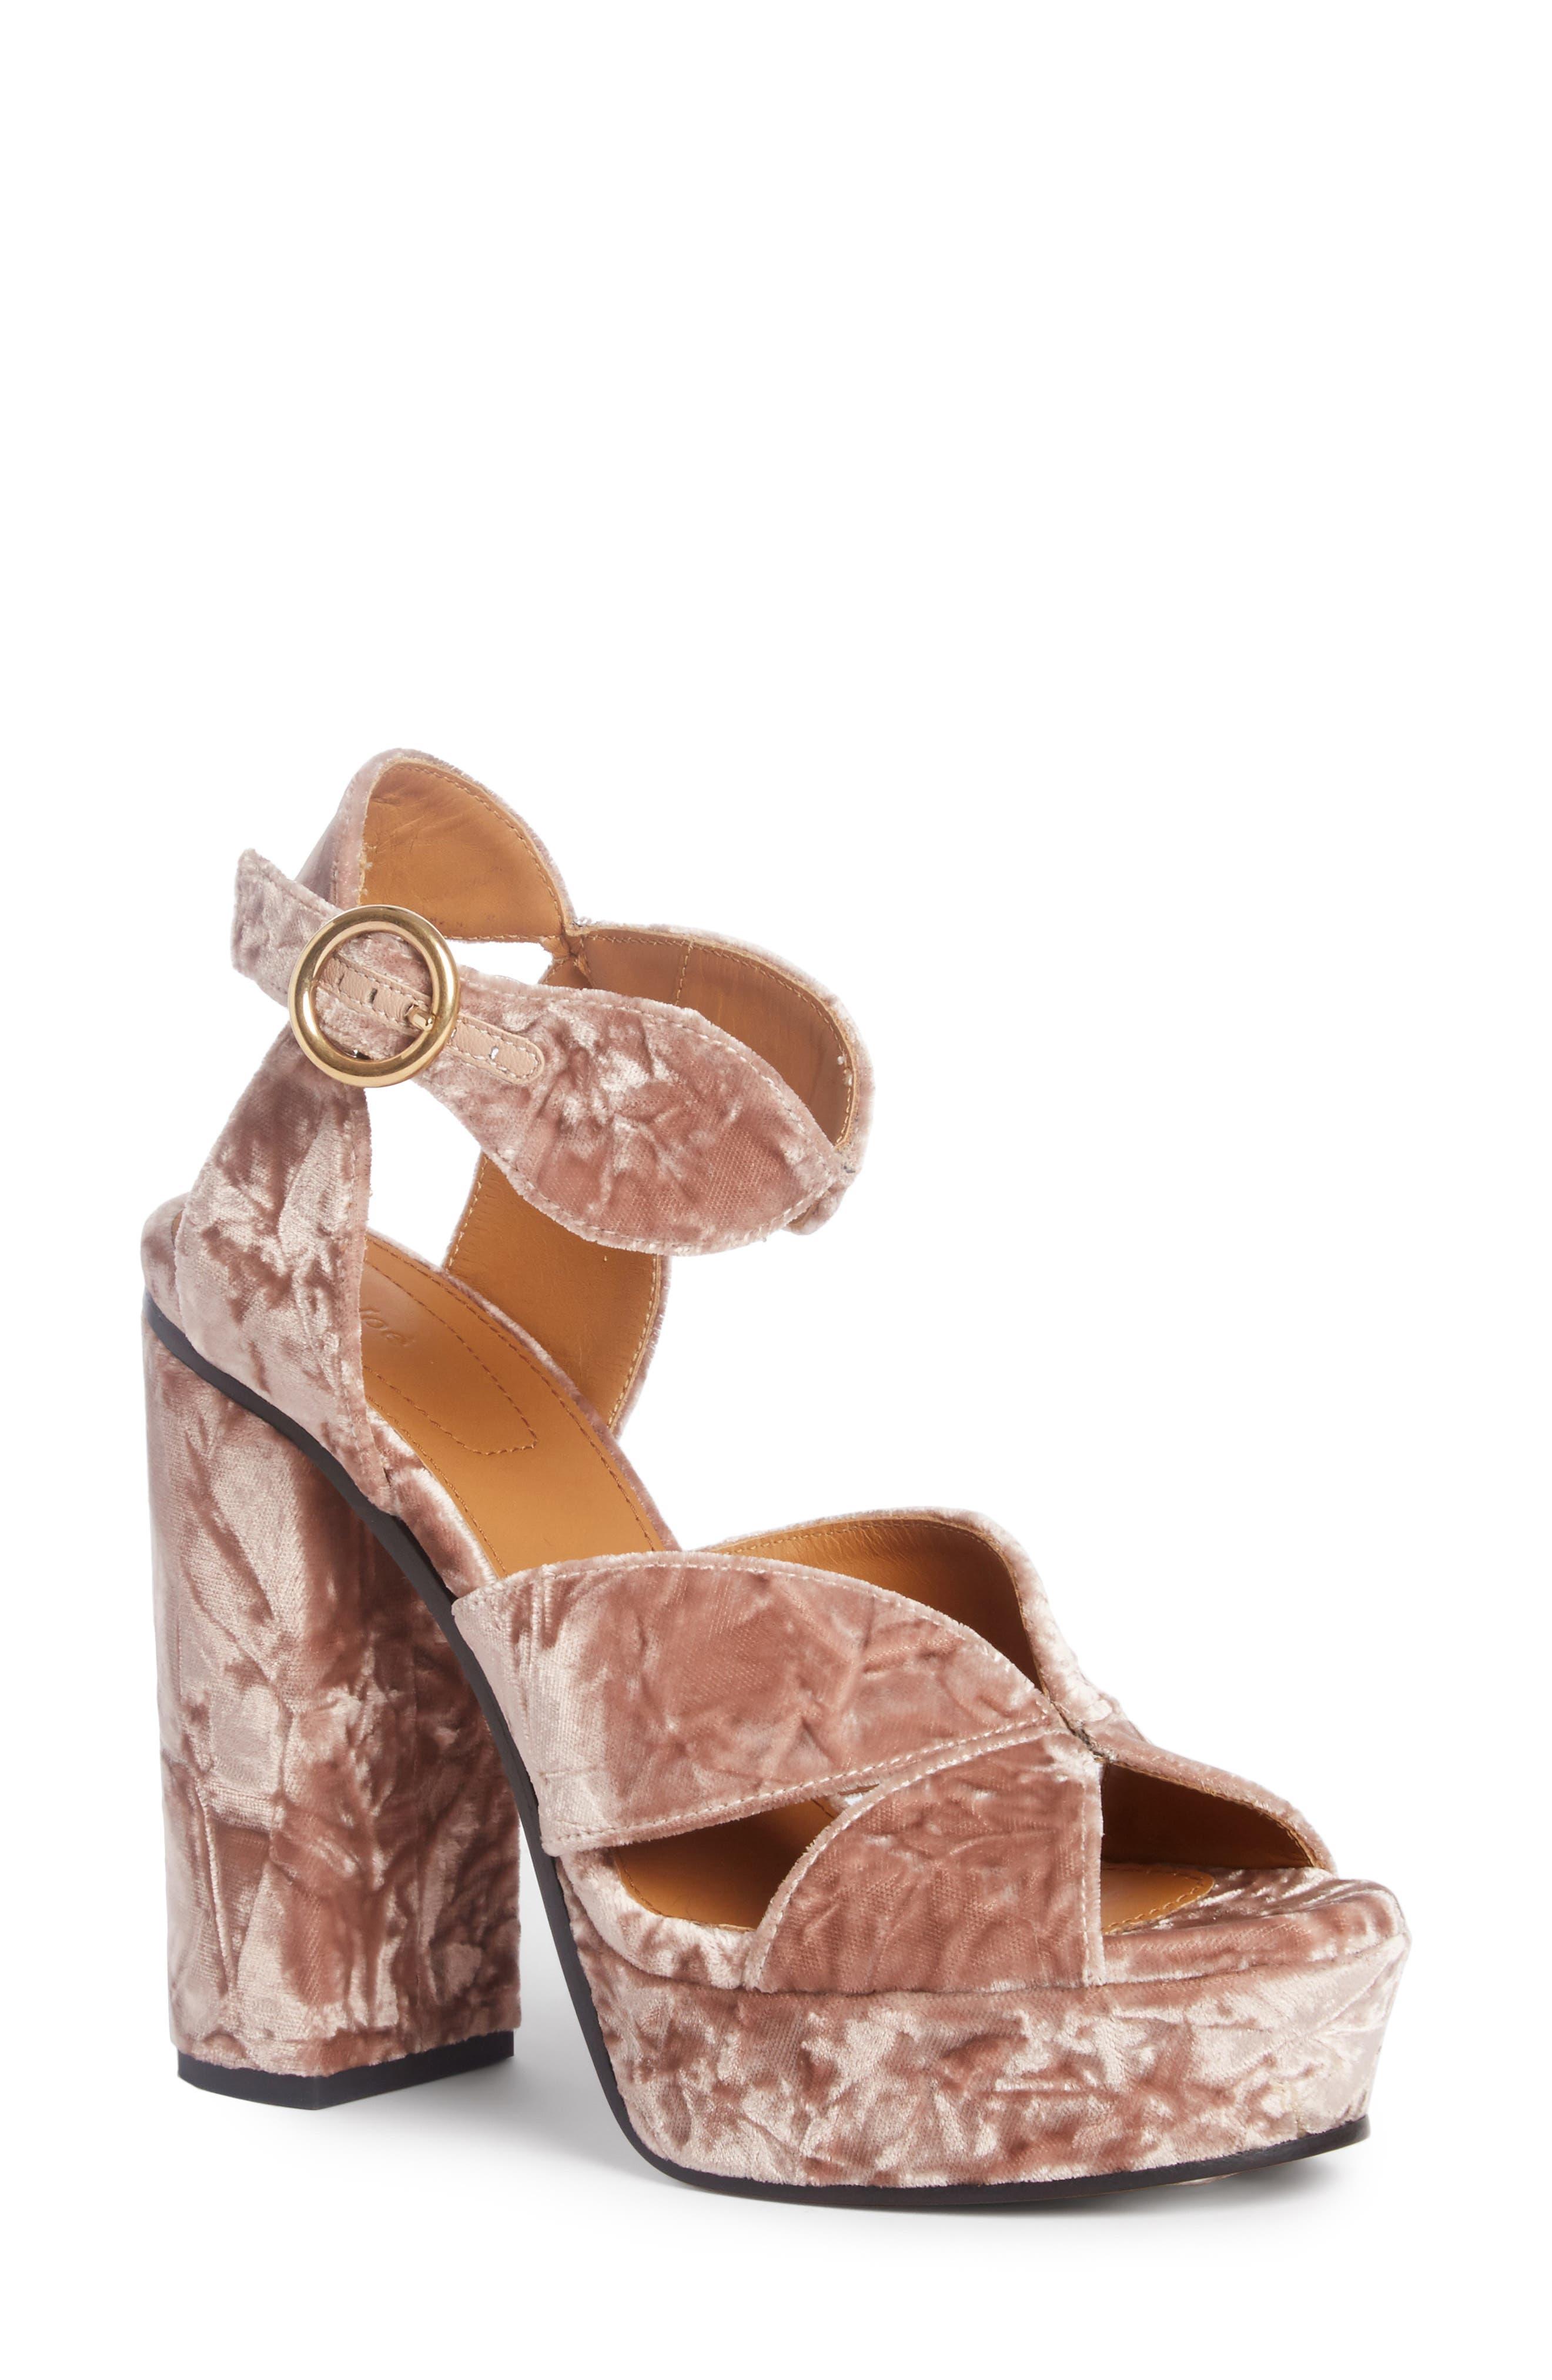 Main Image - Chloé Graphic Leaves Platform Sandal (Women)